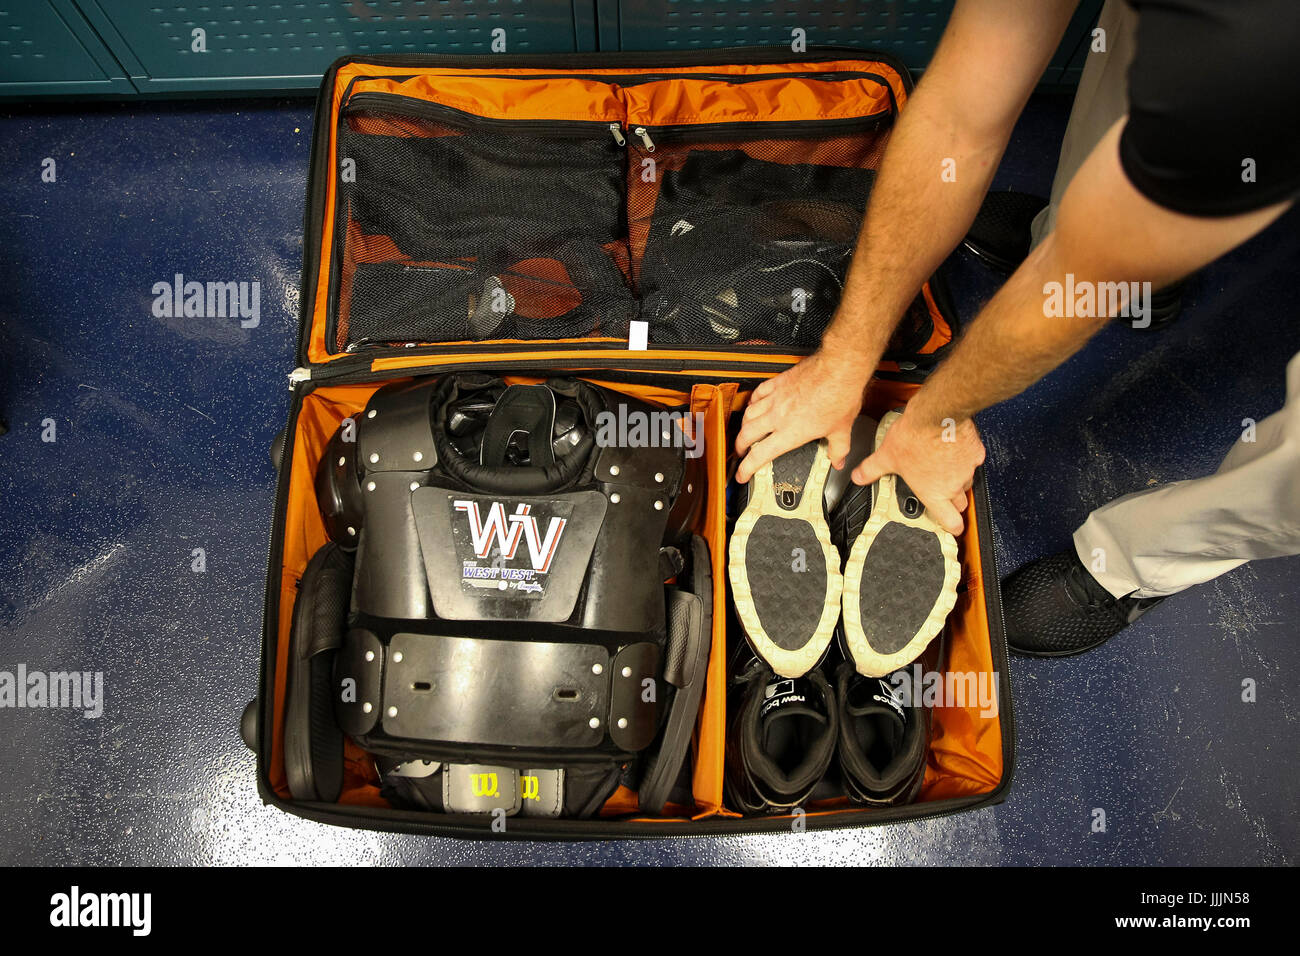 Umpire Gear Stock Photos & Umpire Gear Stock Images - Alamy